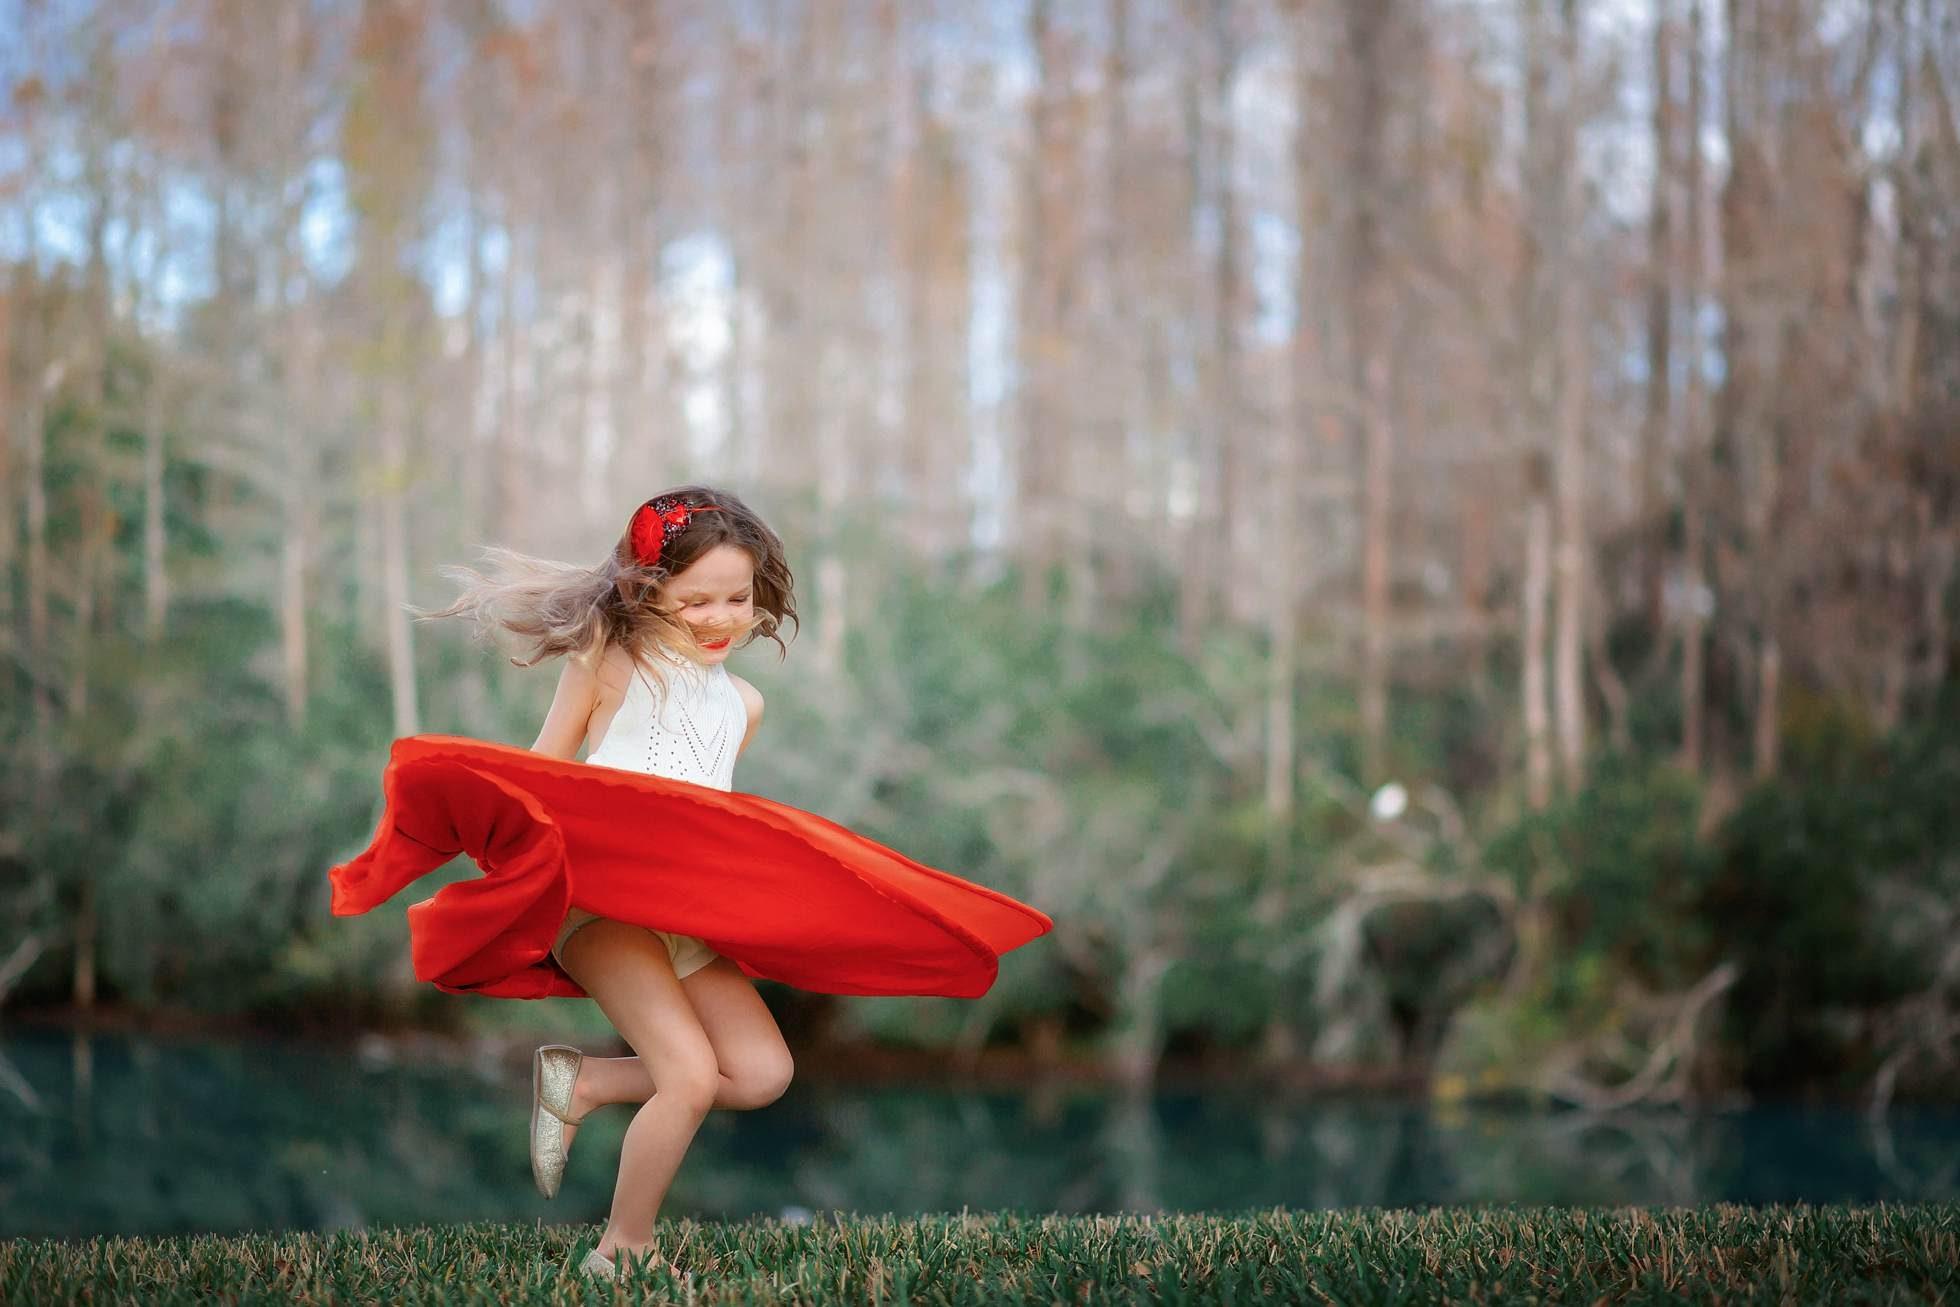 Tampa Photographer | Dana Nicole Photography